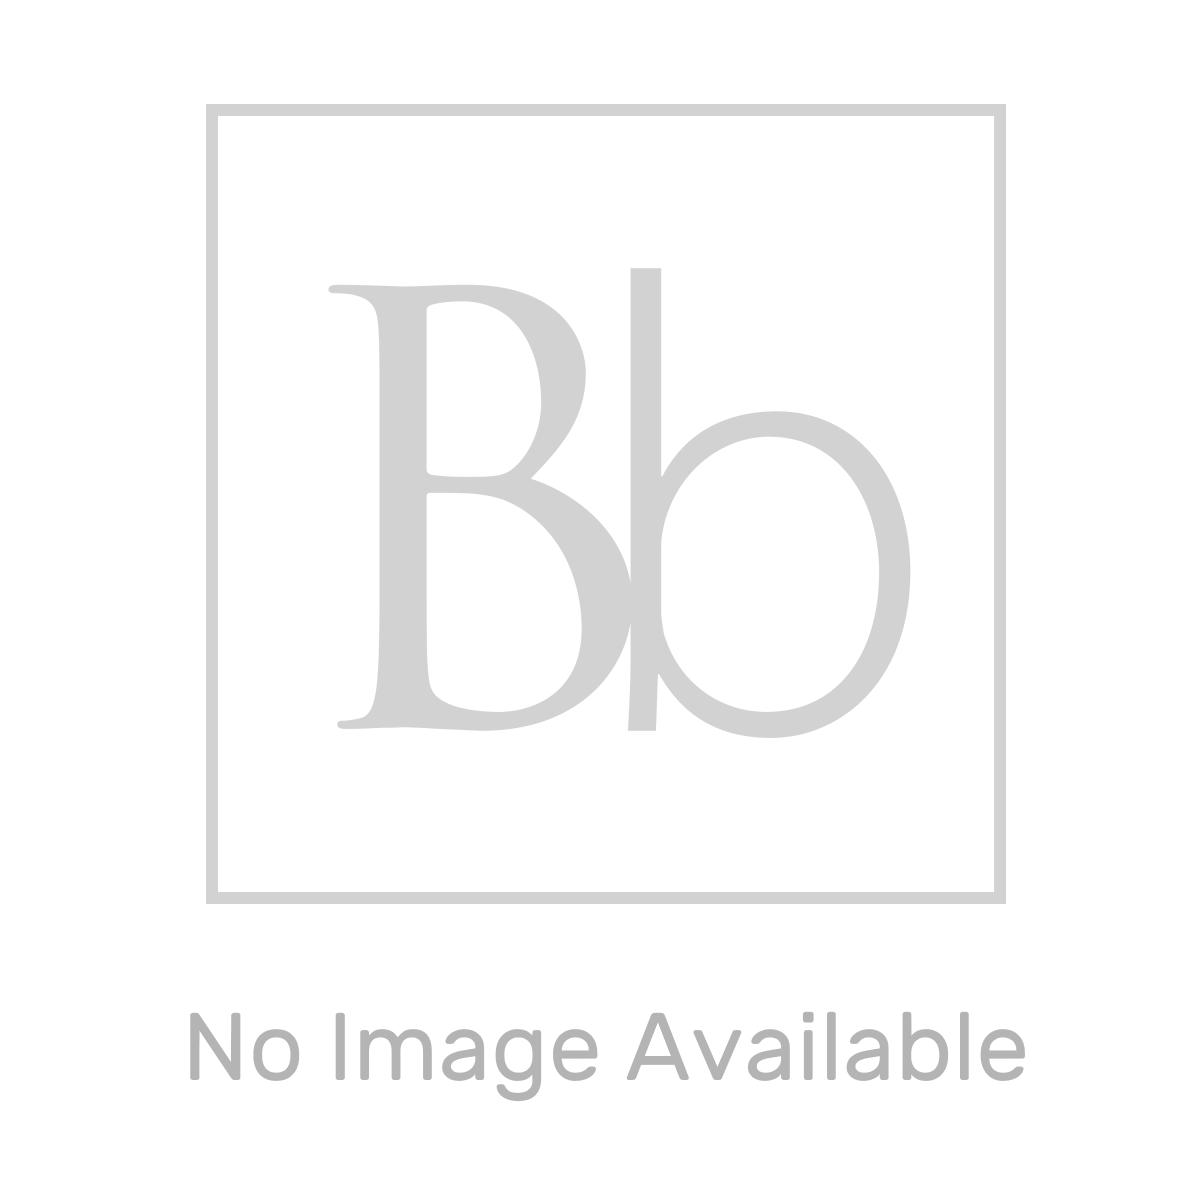 Premier Pearlstone Shower Tray Riser Kit 1000 - 1700mm Fitting